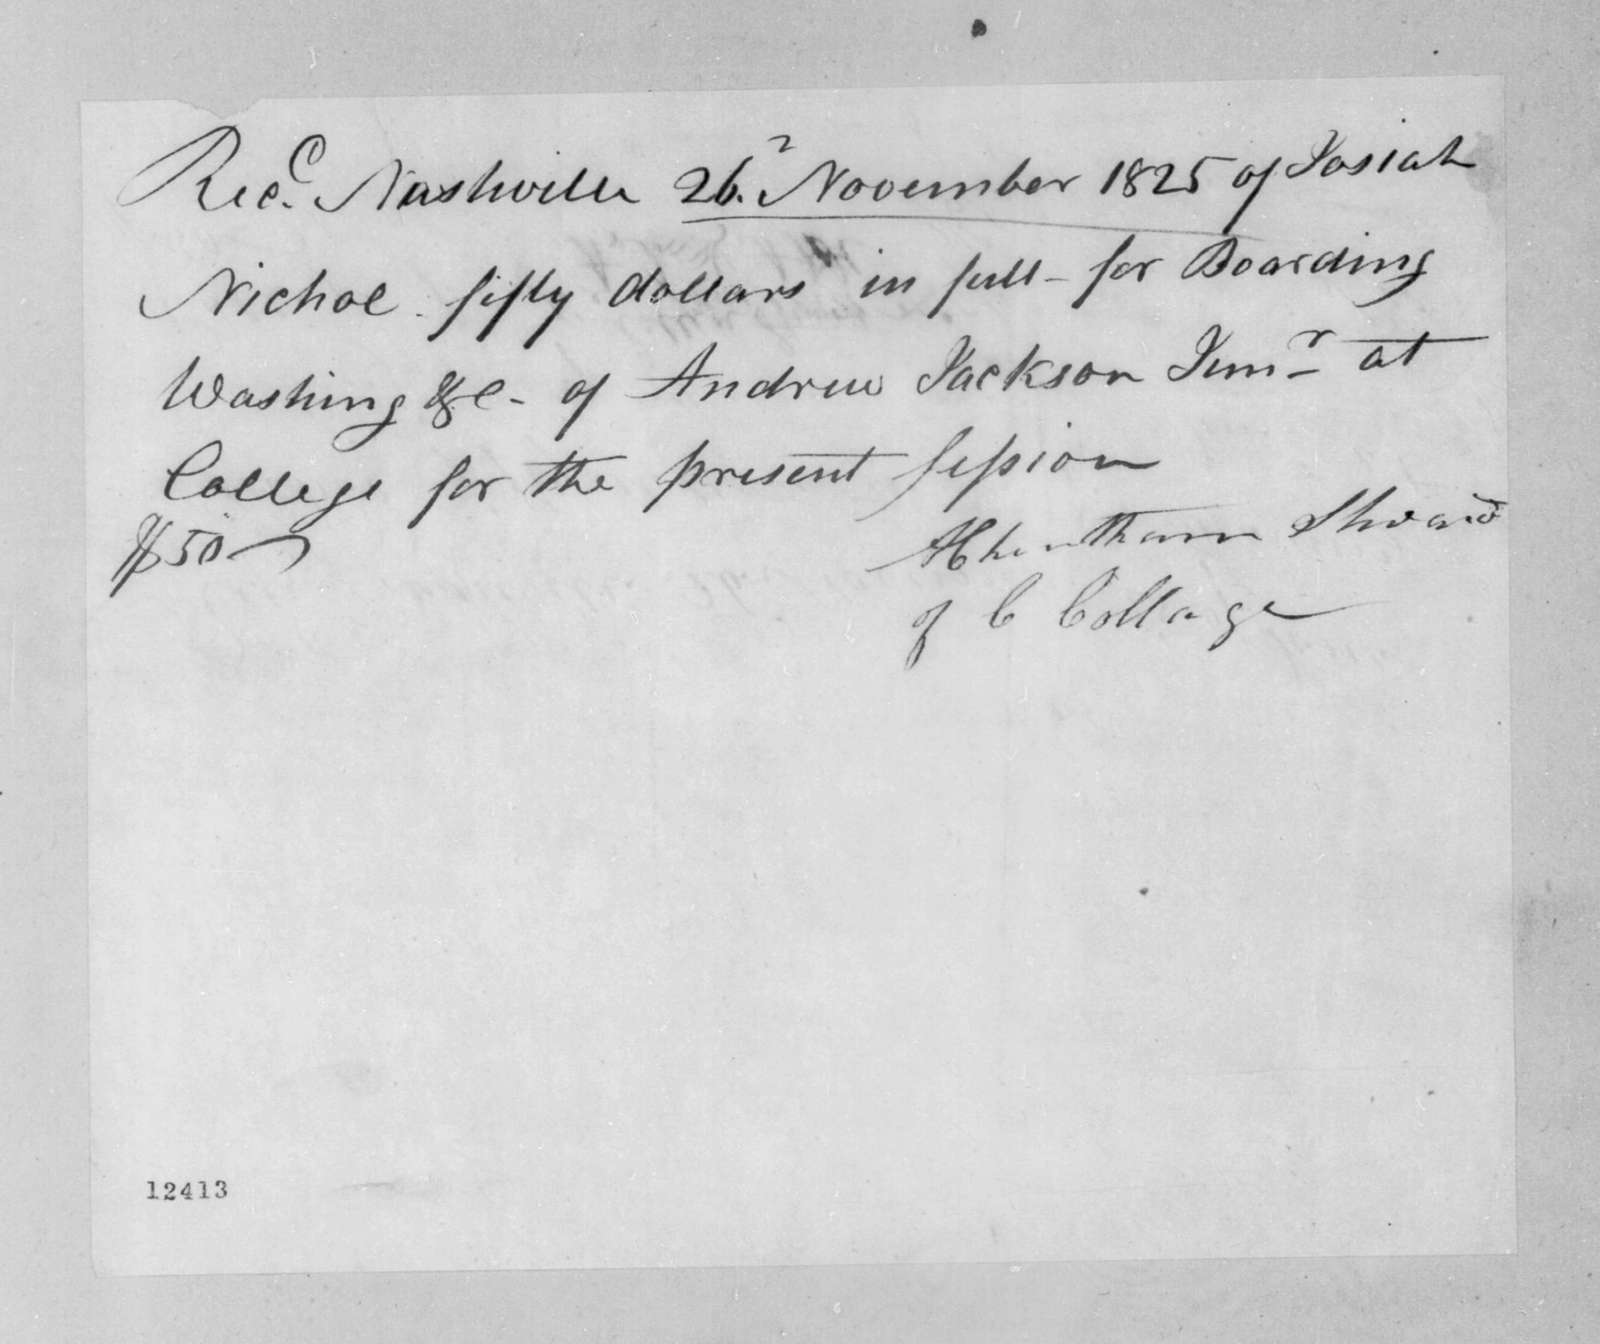 Anderson Cheatham to Josiah Nicholl, November 26, 1825